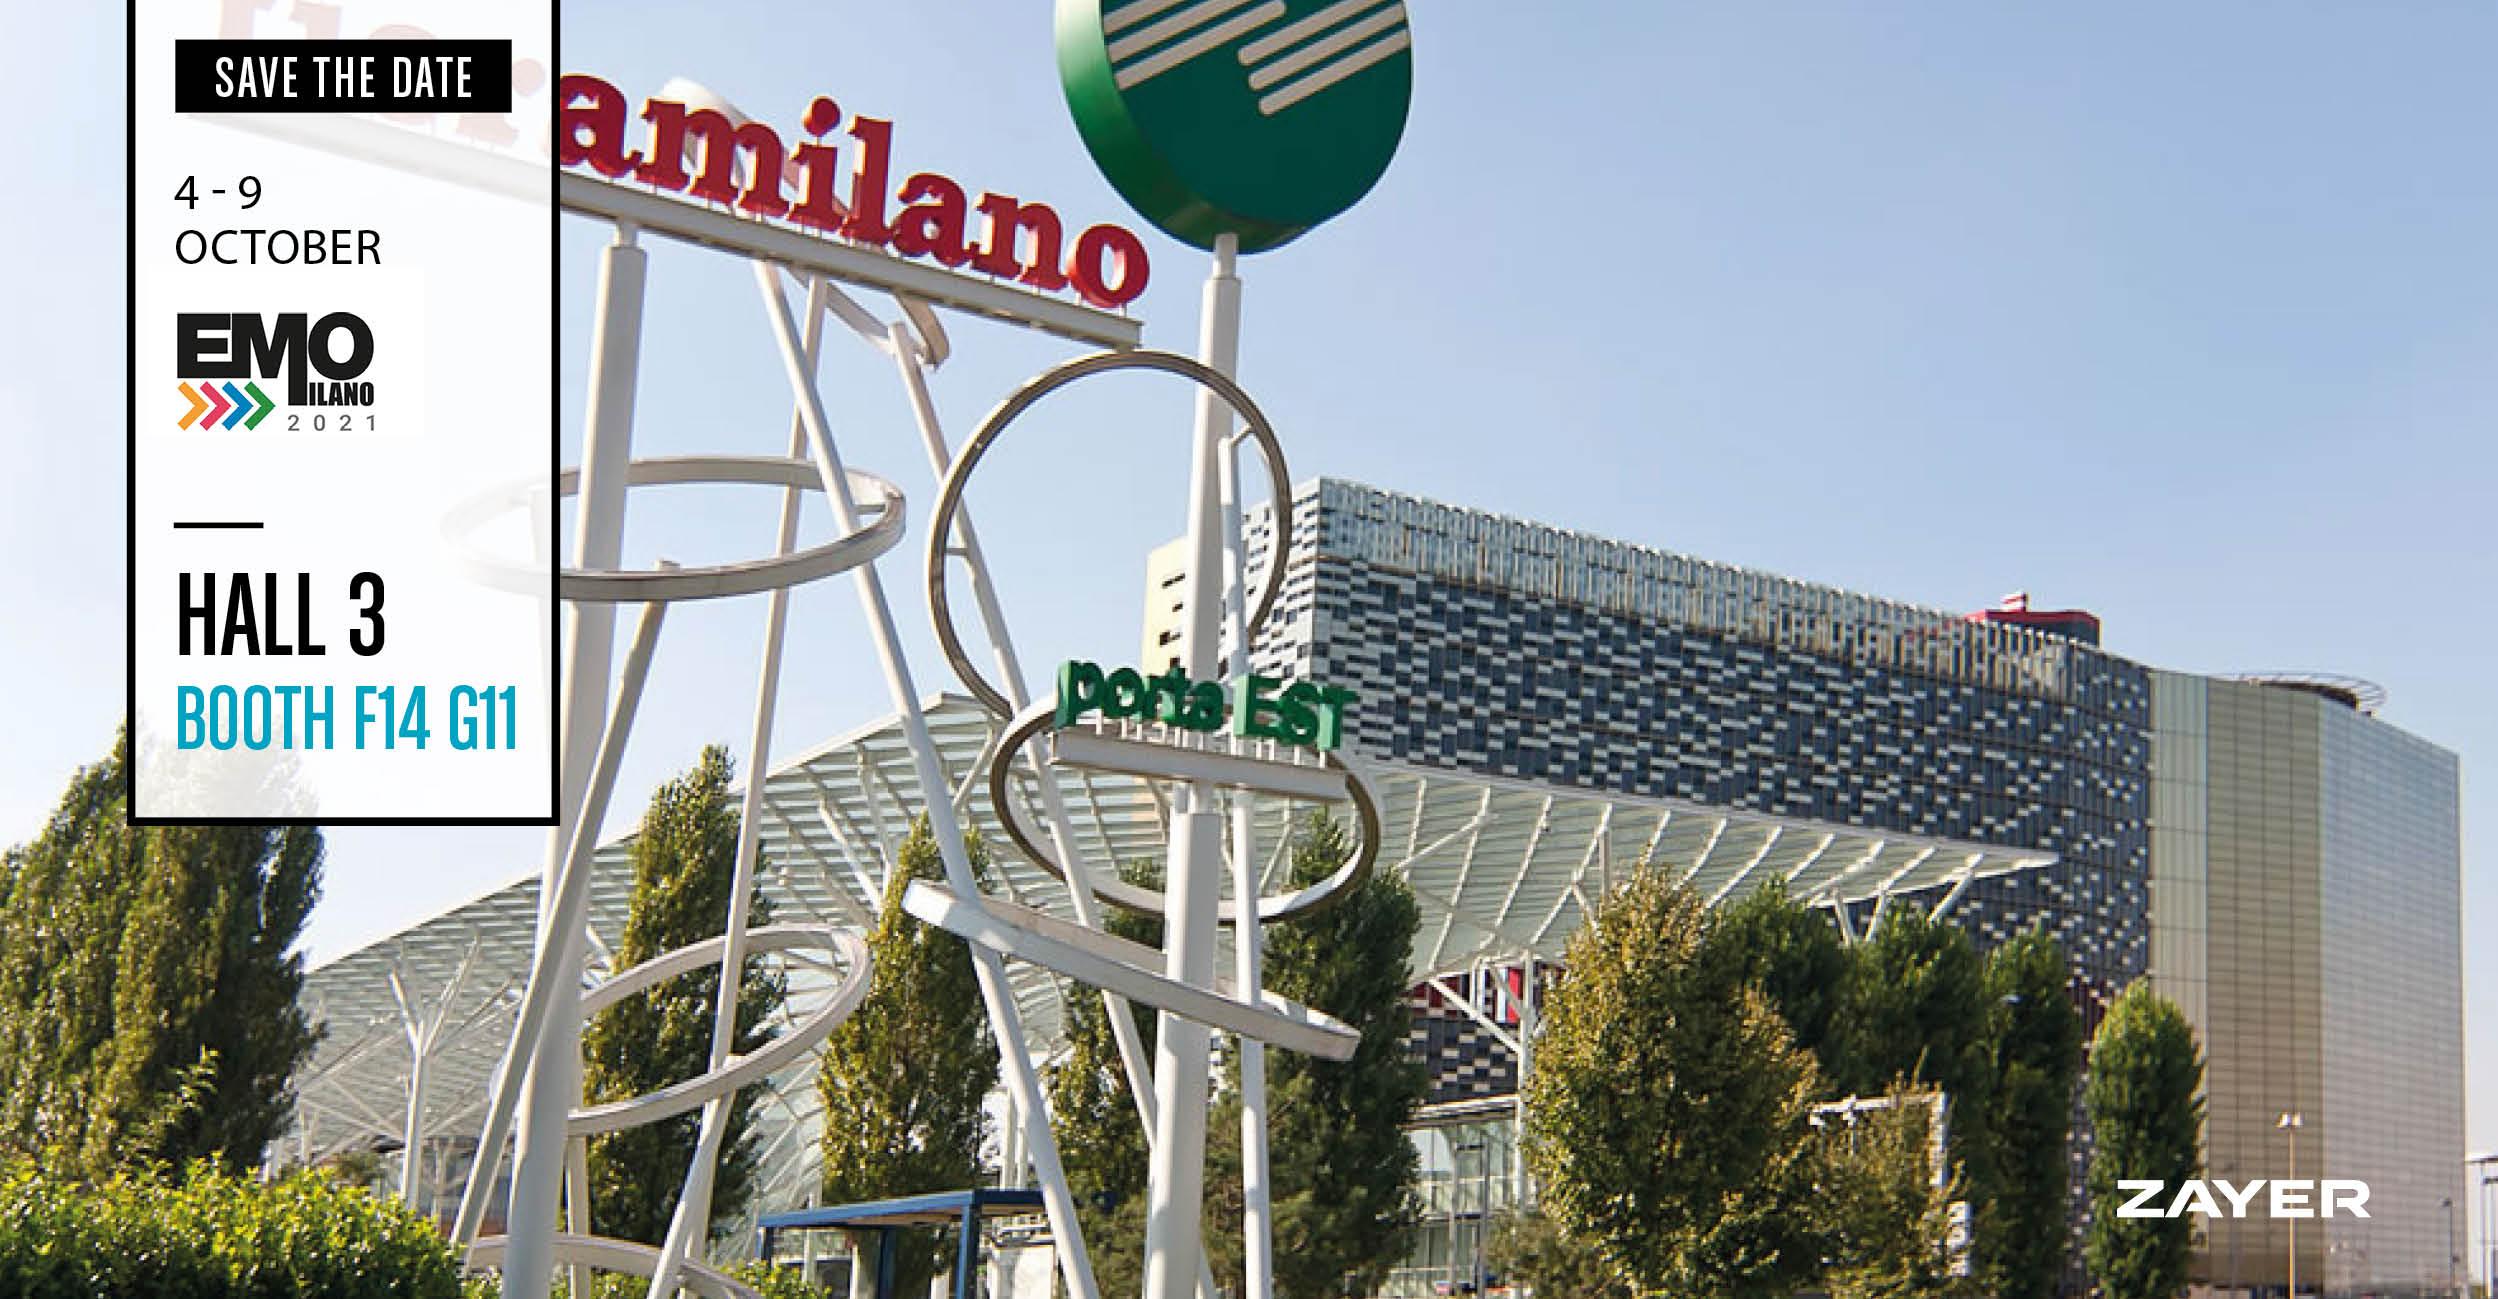 ZAYER willbe attending EMO Milano 2021